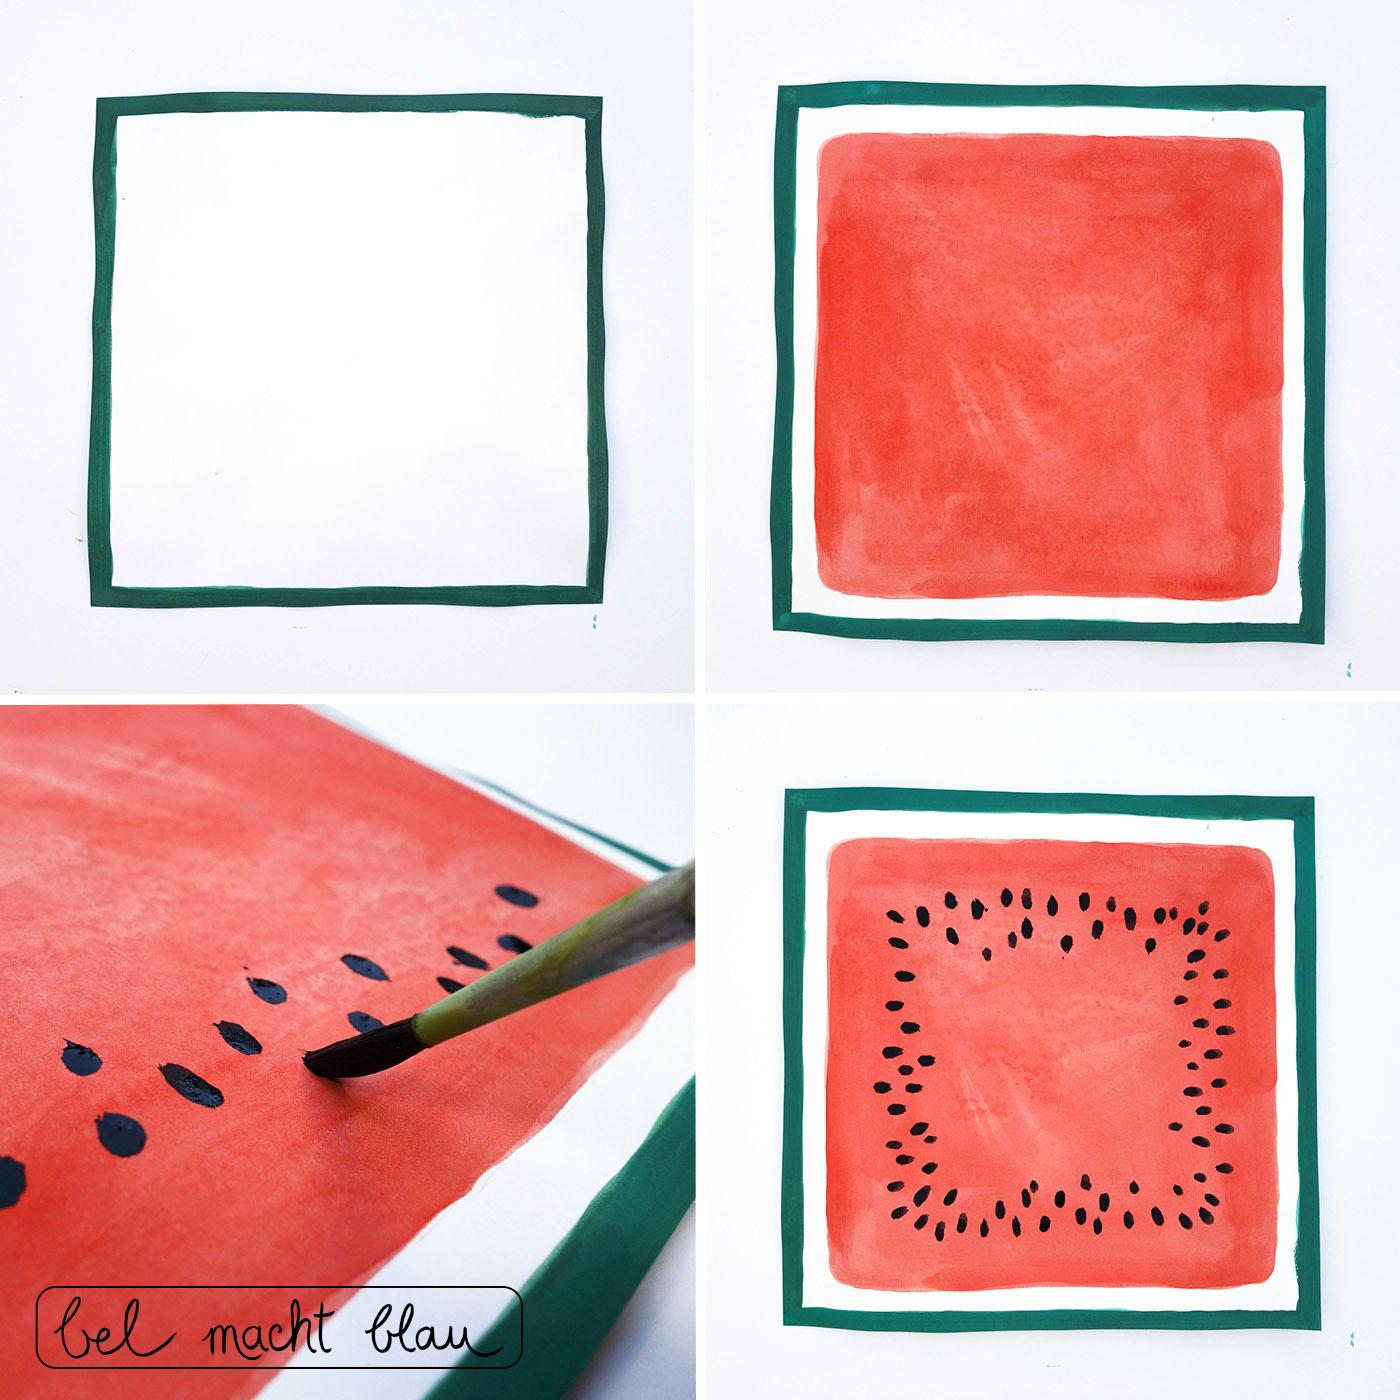 Malen Schritt-für-Schritt: eckige Wassermelone